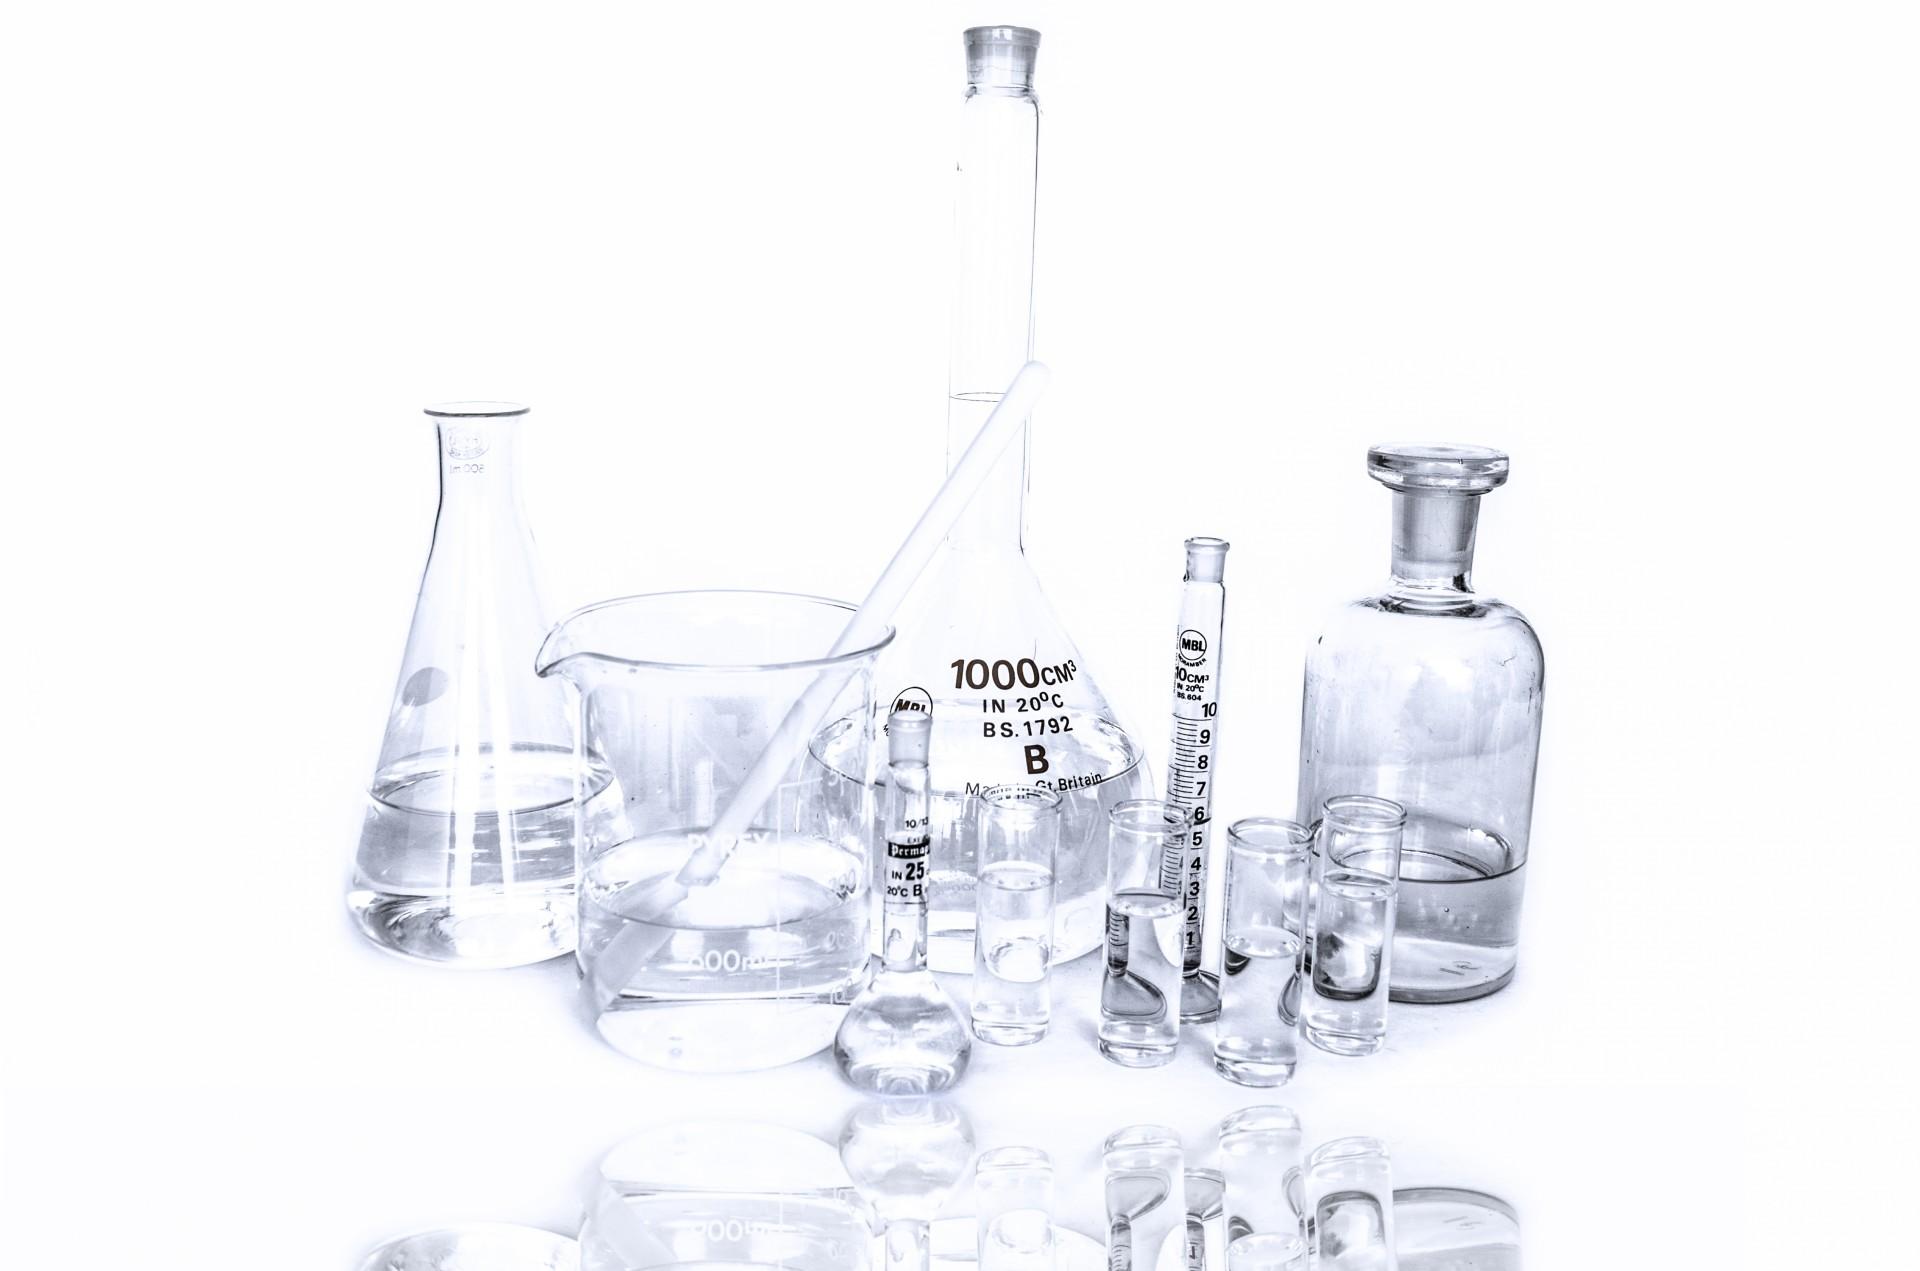 laboratory-glassware-1379145099WiP